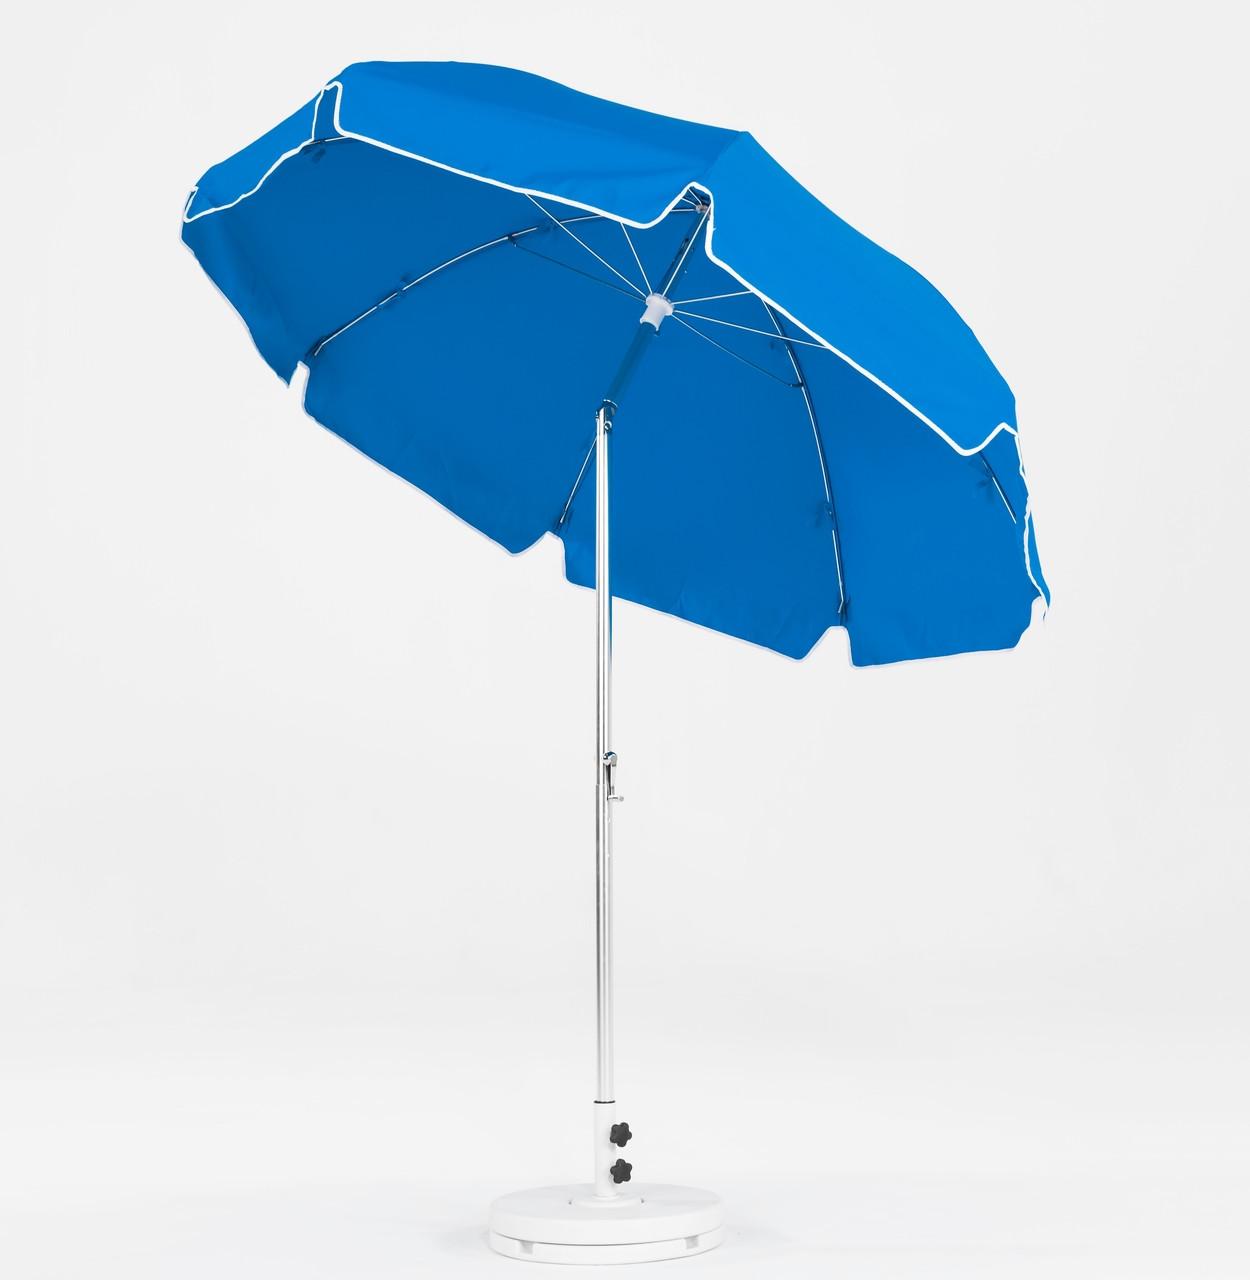 resort contract commercial steel patio umbrella with crank 7 5 octagon